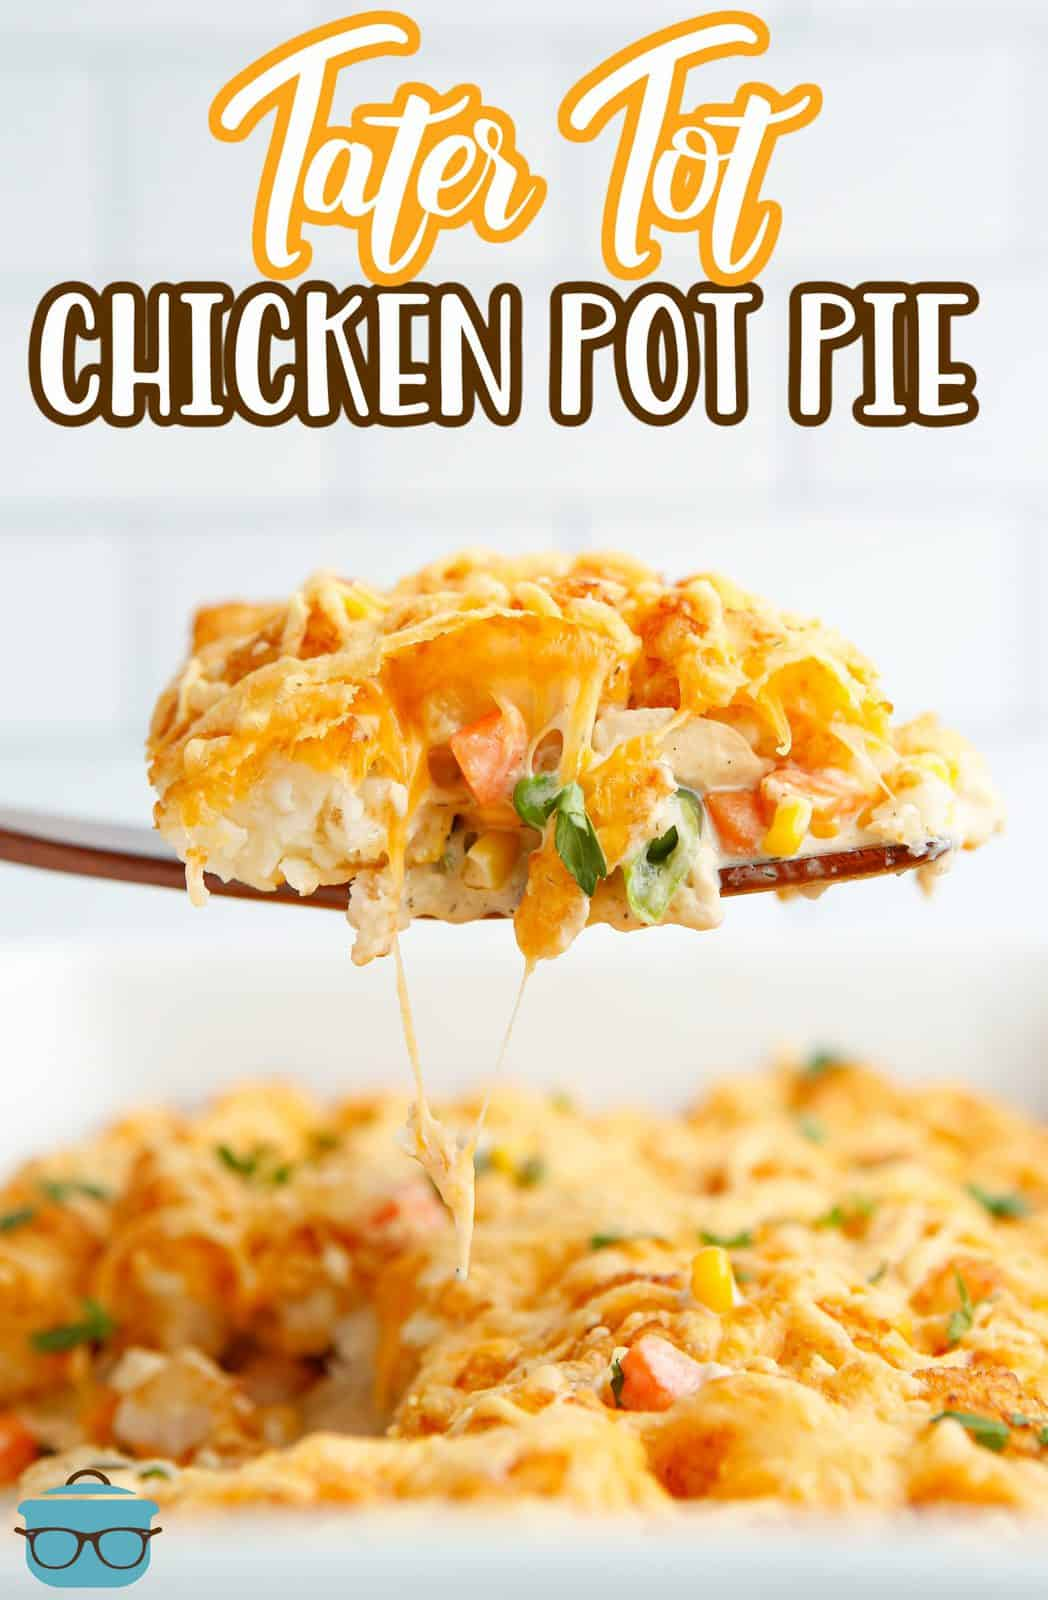 Pinterest image of Tater Tot Chicken Pot Pie on wooden server.